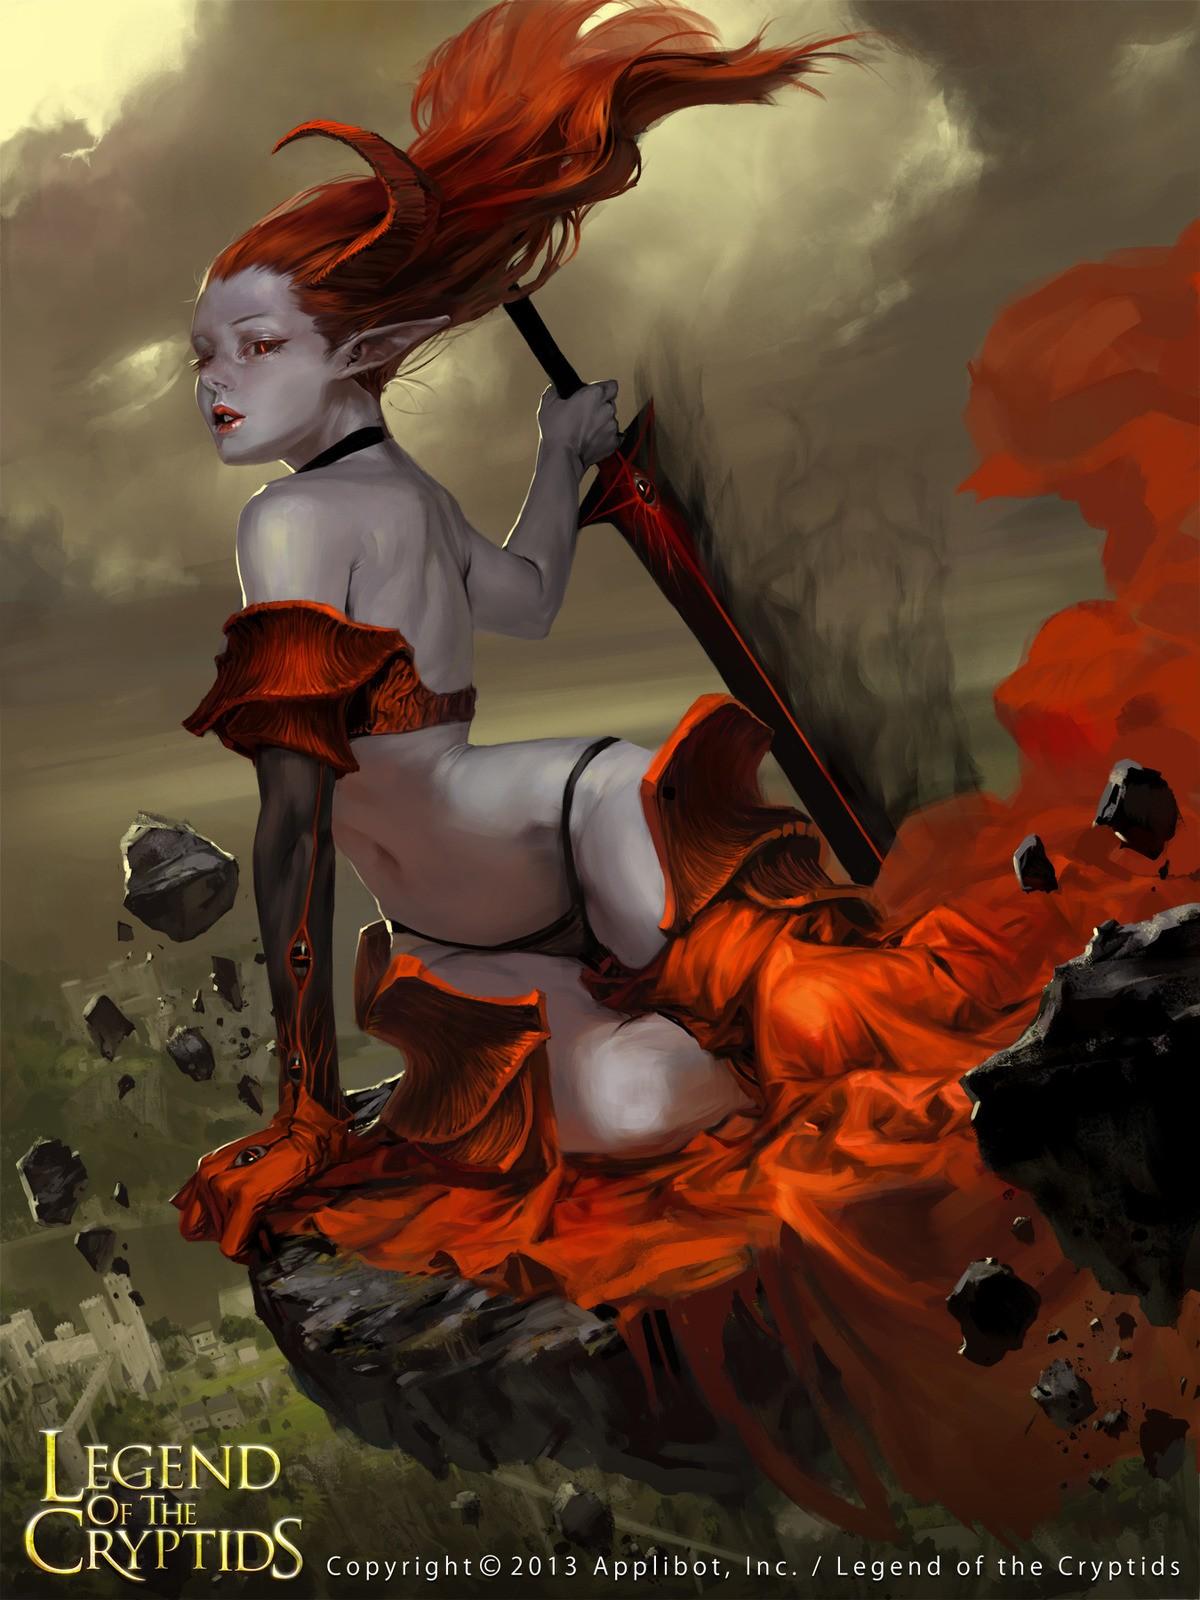 General 1200x1600 Legend of the Cryptids redhead 2013 (Year) horns succubus fantasy girl fantasy art demon girls back belly bikini